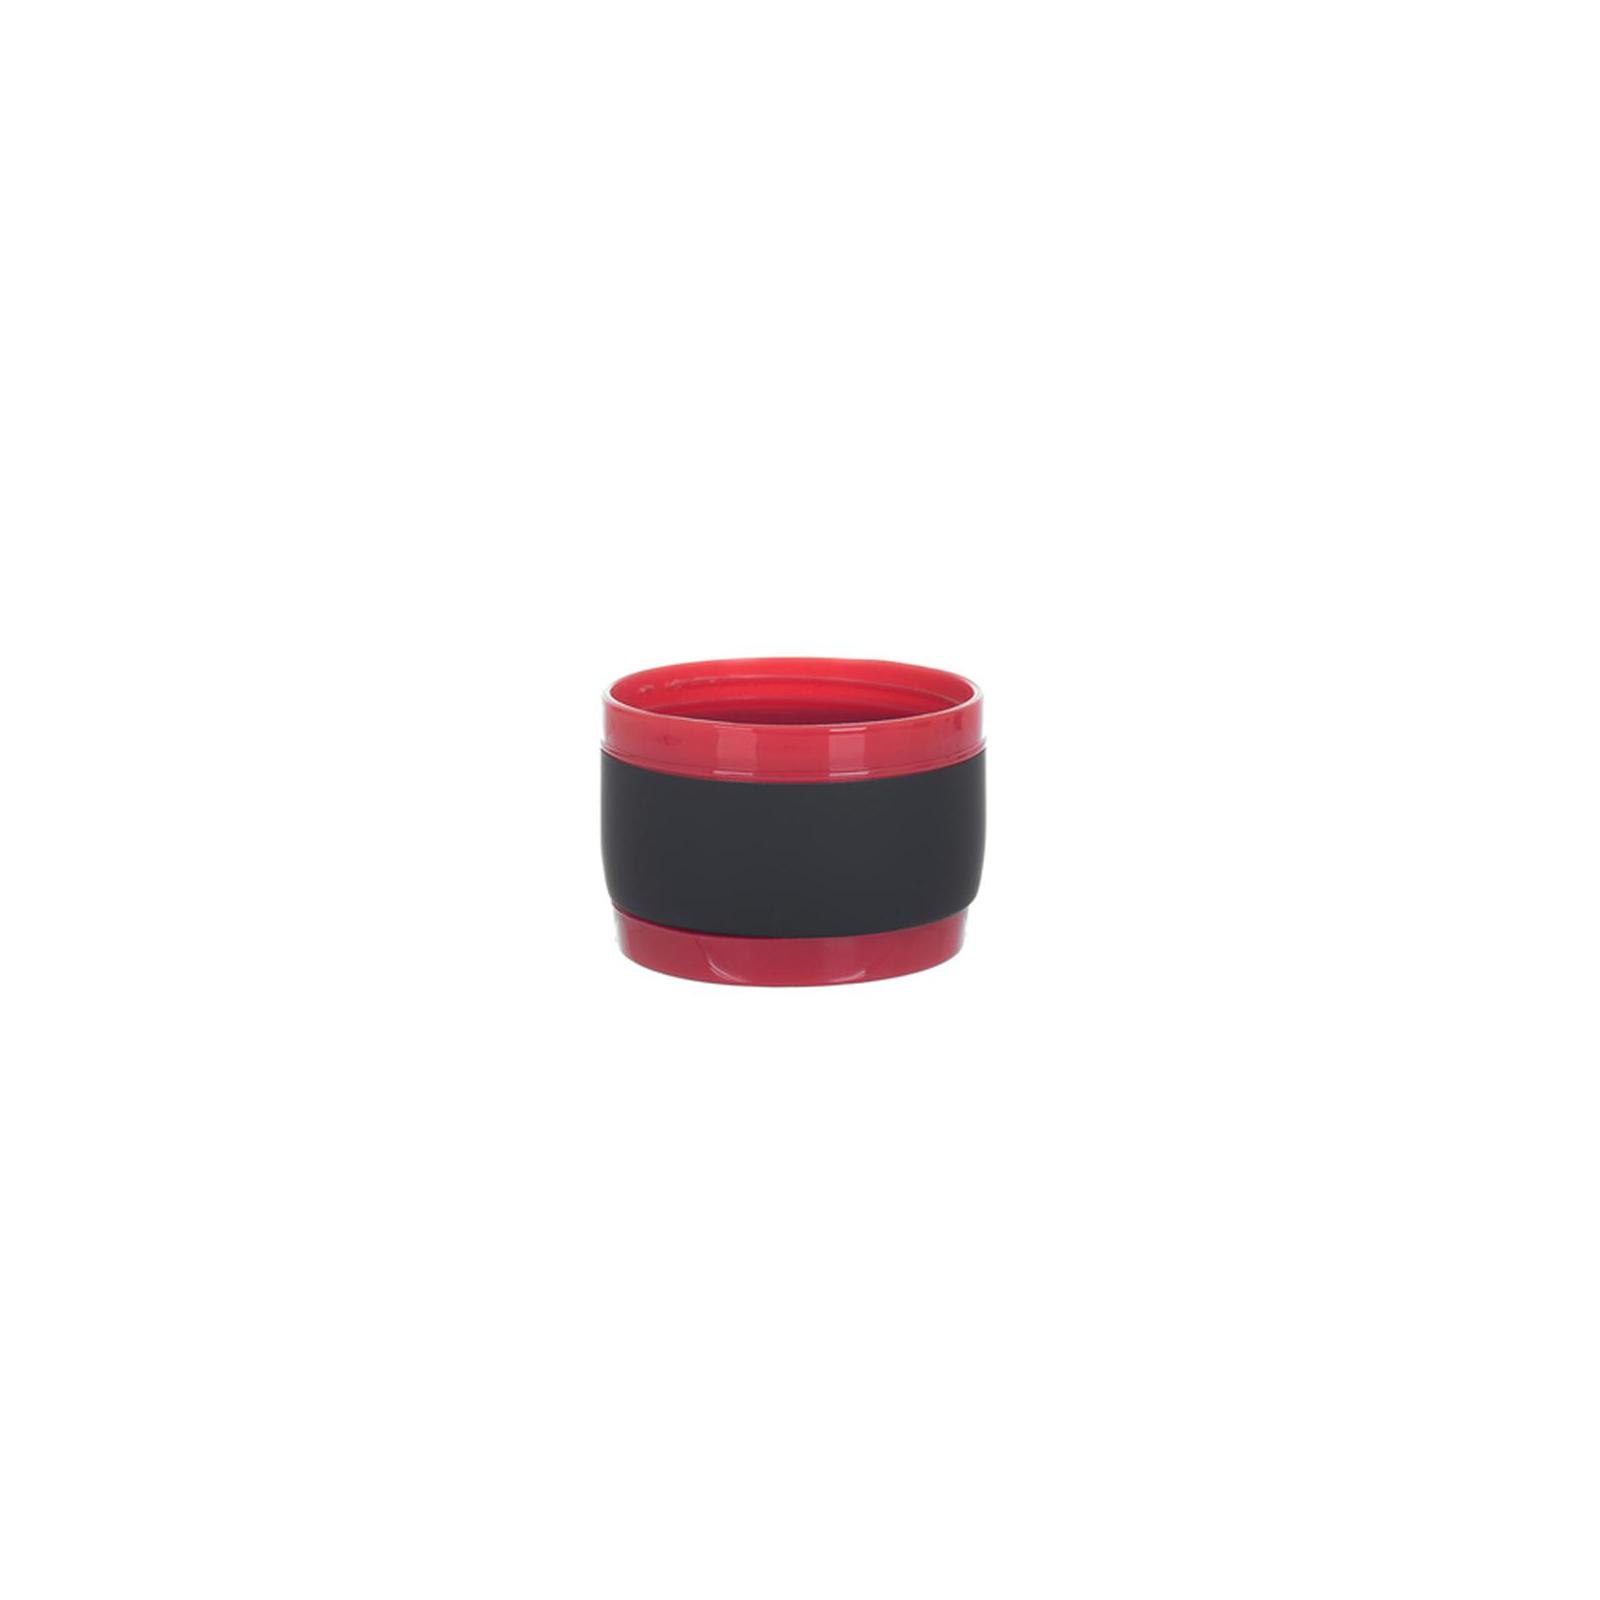 Термос Ringel Solo 0.4 L Black (RG-6101-400/2) изображение 6